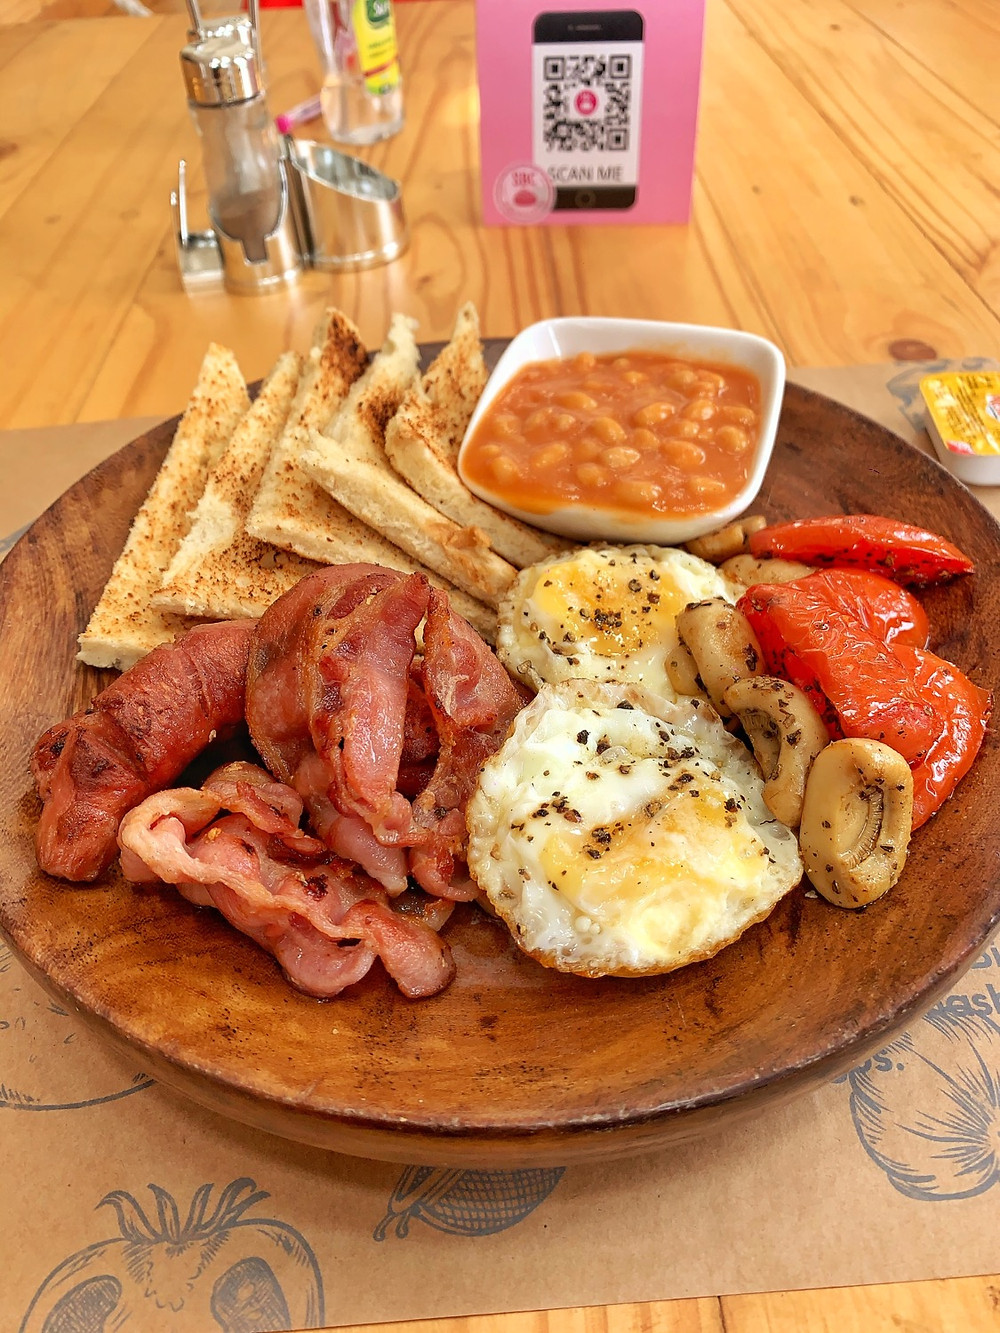 Full English Breakfast from SBC bakehouse